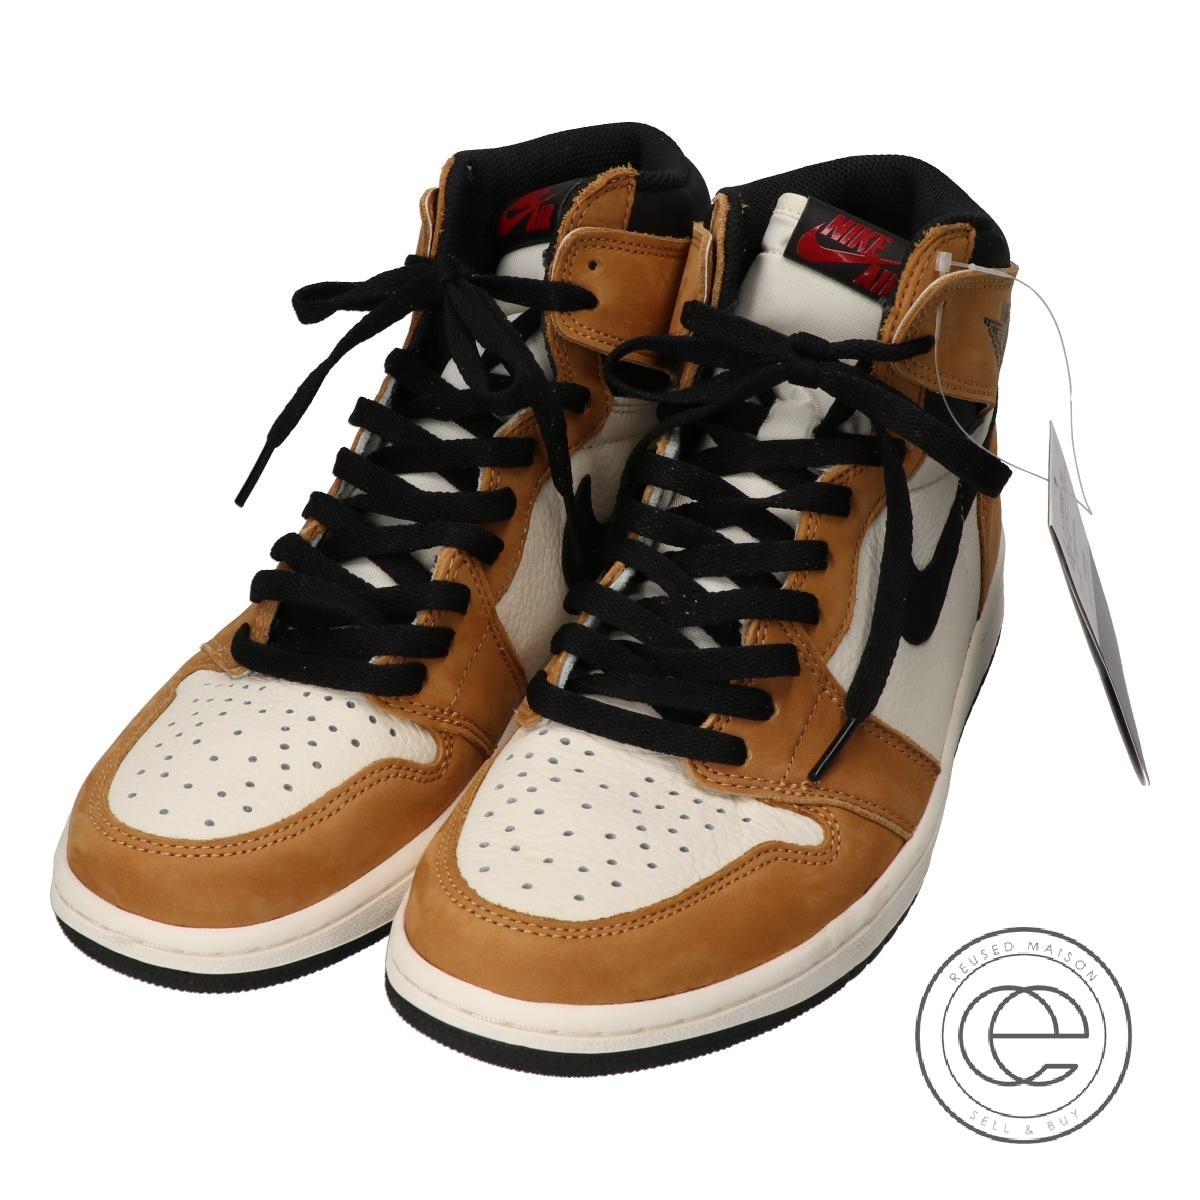 d7481f1c132 NIKE / Nike555,088-700 AIR JORDAN 1 RETRO HIGH OG ROOKIE OF THE YEAR Air  Jordan 1 nostalgic high Aussie sneakers shoes